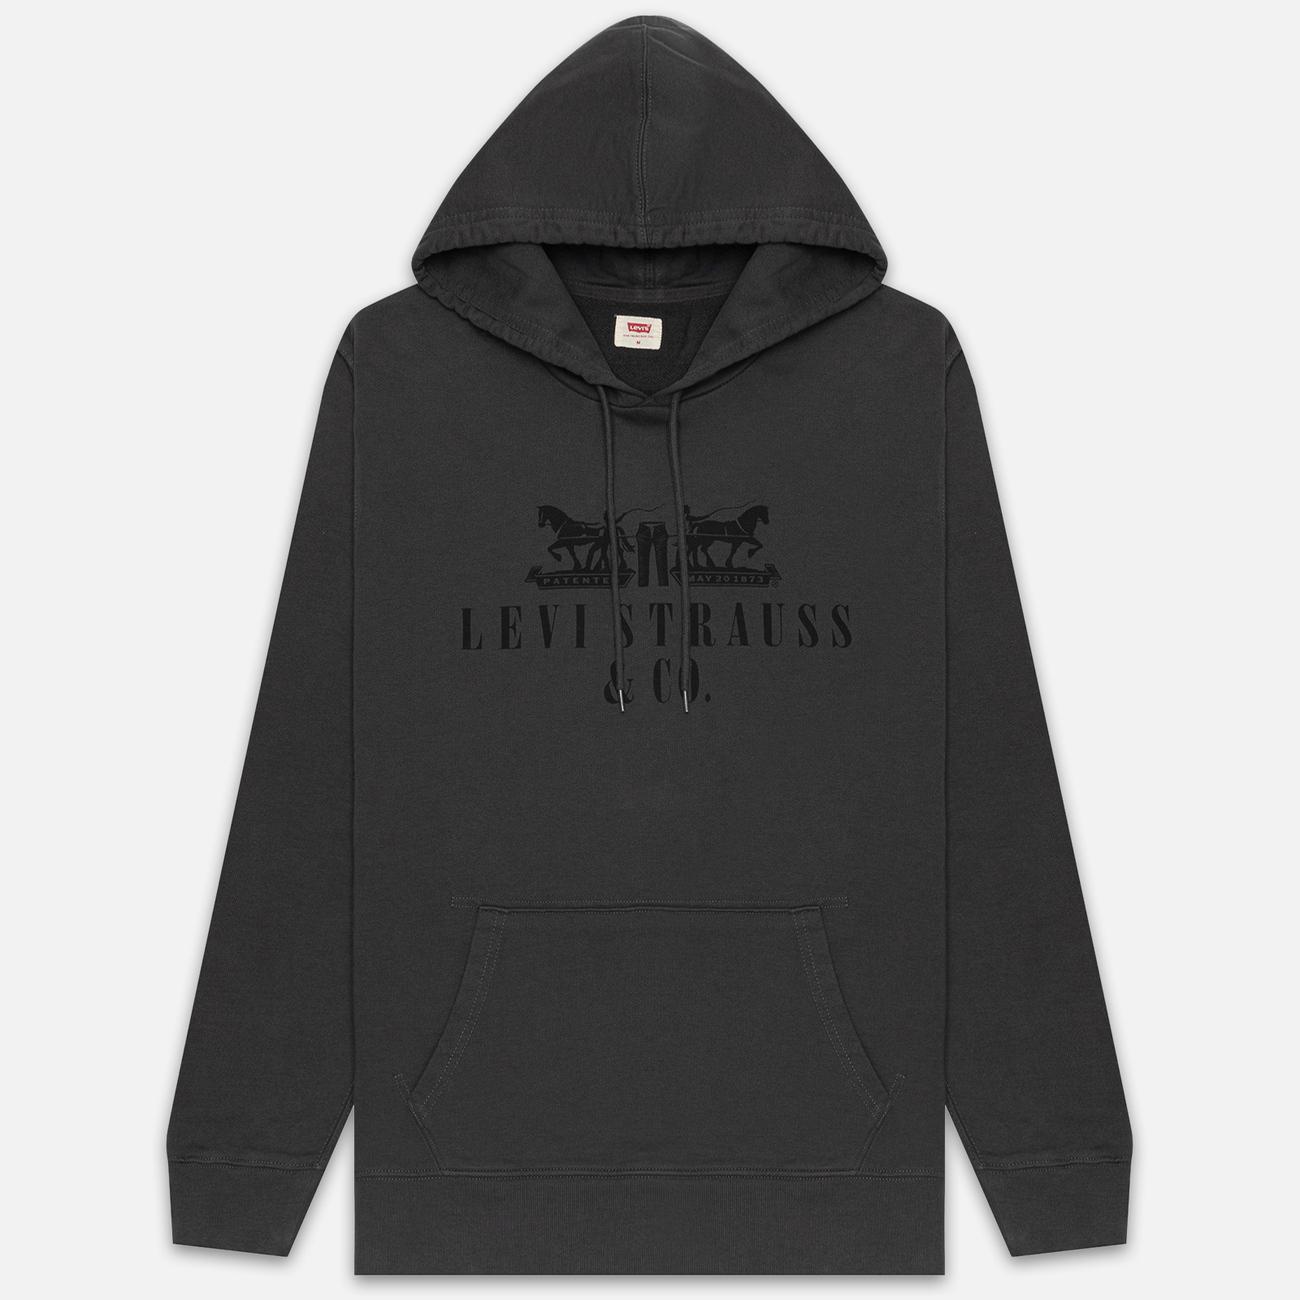 Мужская толстовка Levi's Graphic Hoodie Forged Iron